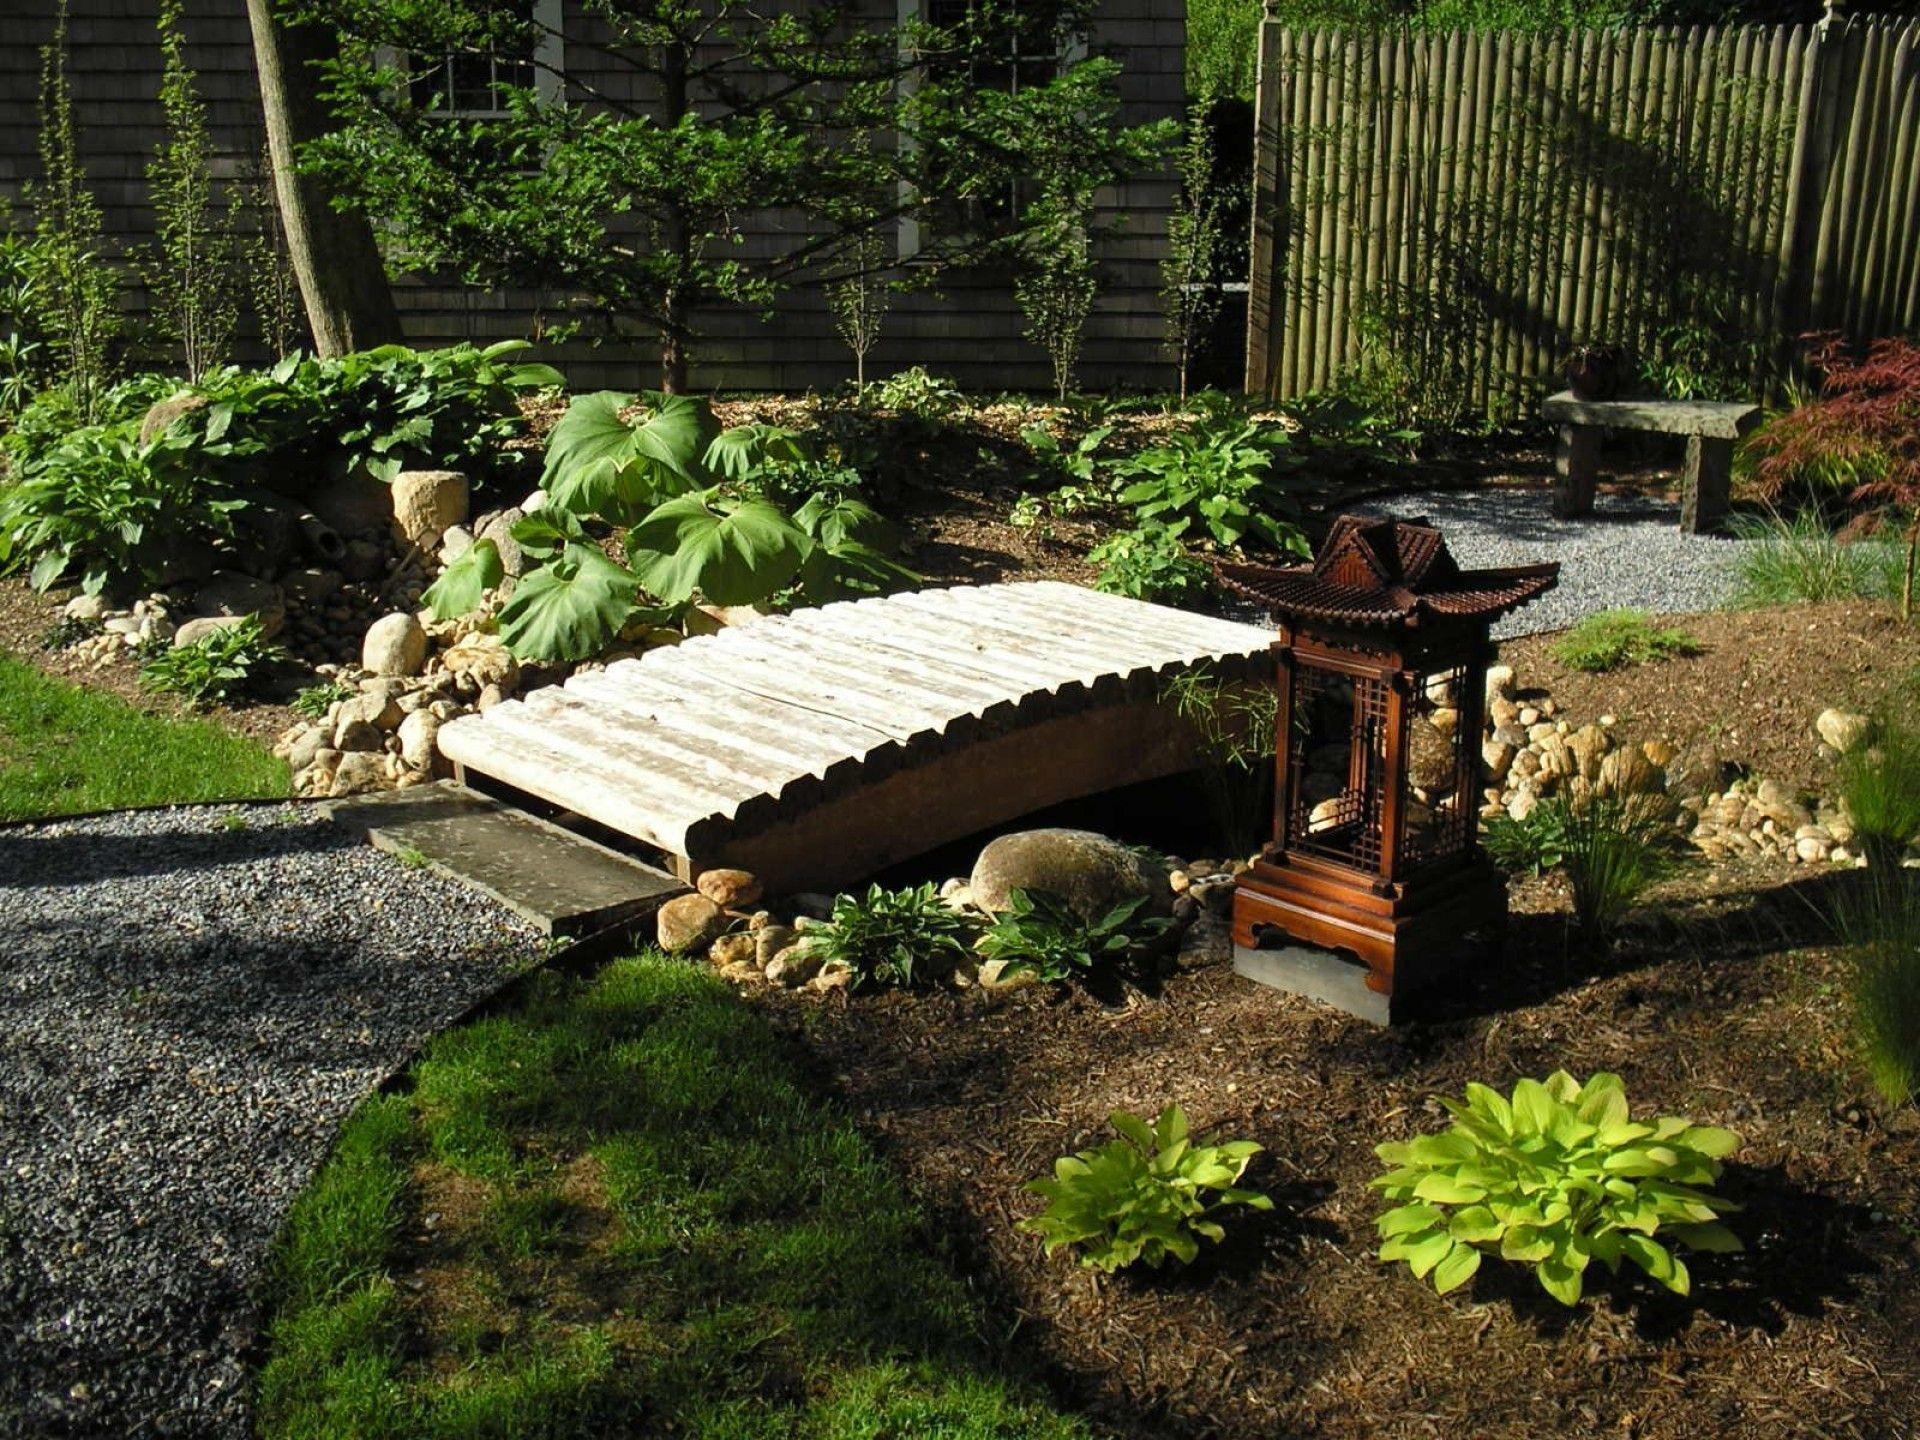 21 Beautiful Zen Garden Ideas 2019 Zengarden Miniature Backyard Diy Landscape Garden Design Asian Garden Japanese Garden Design